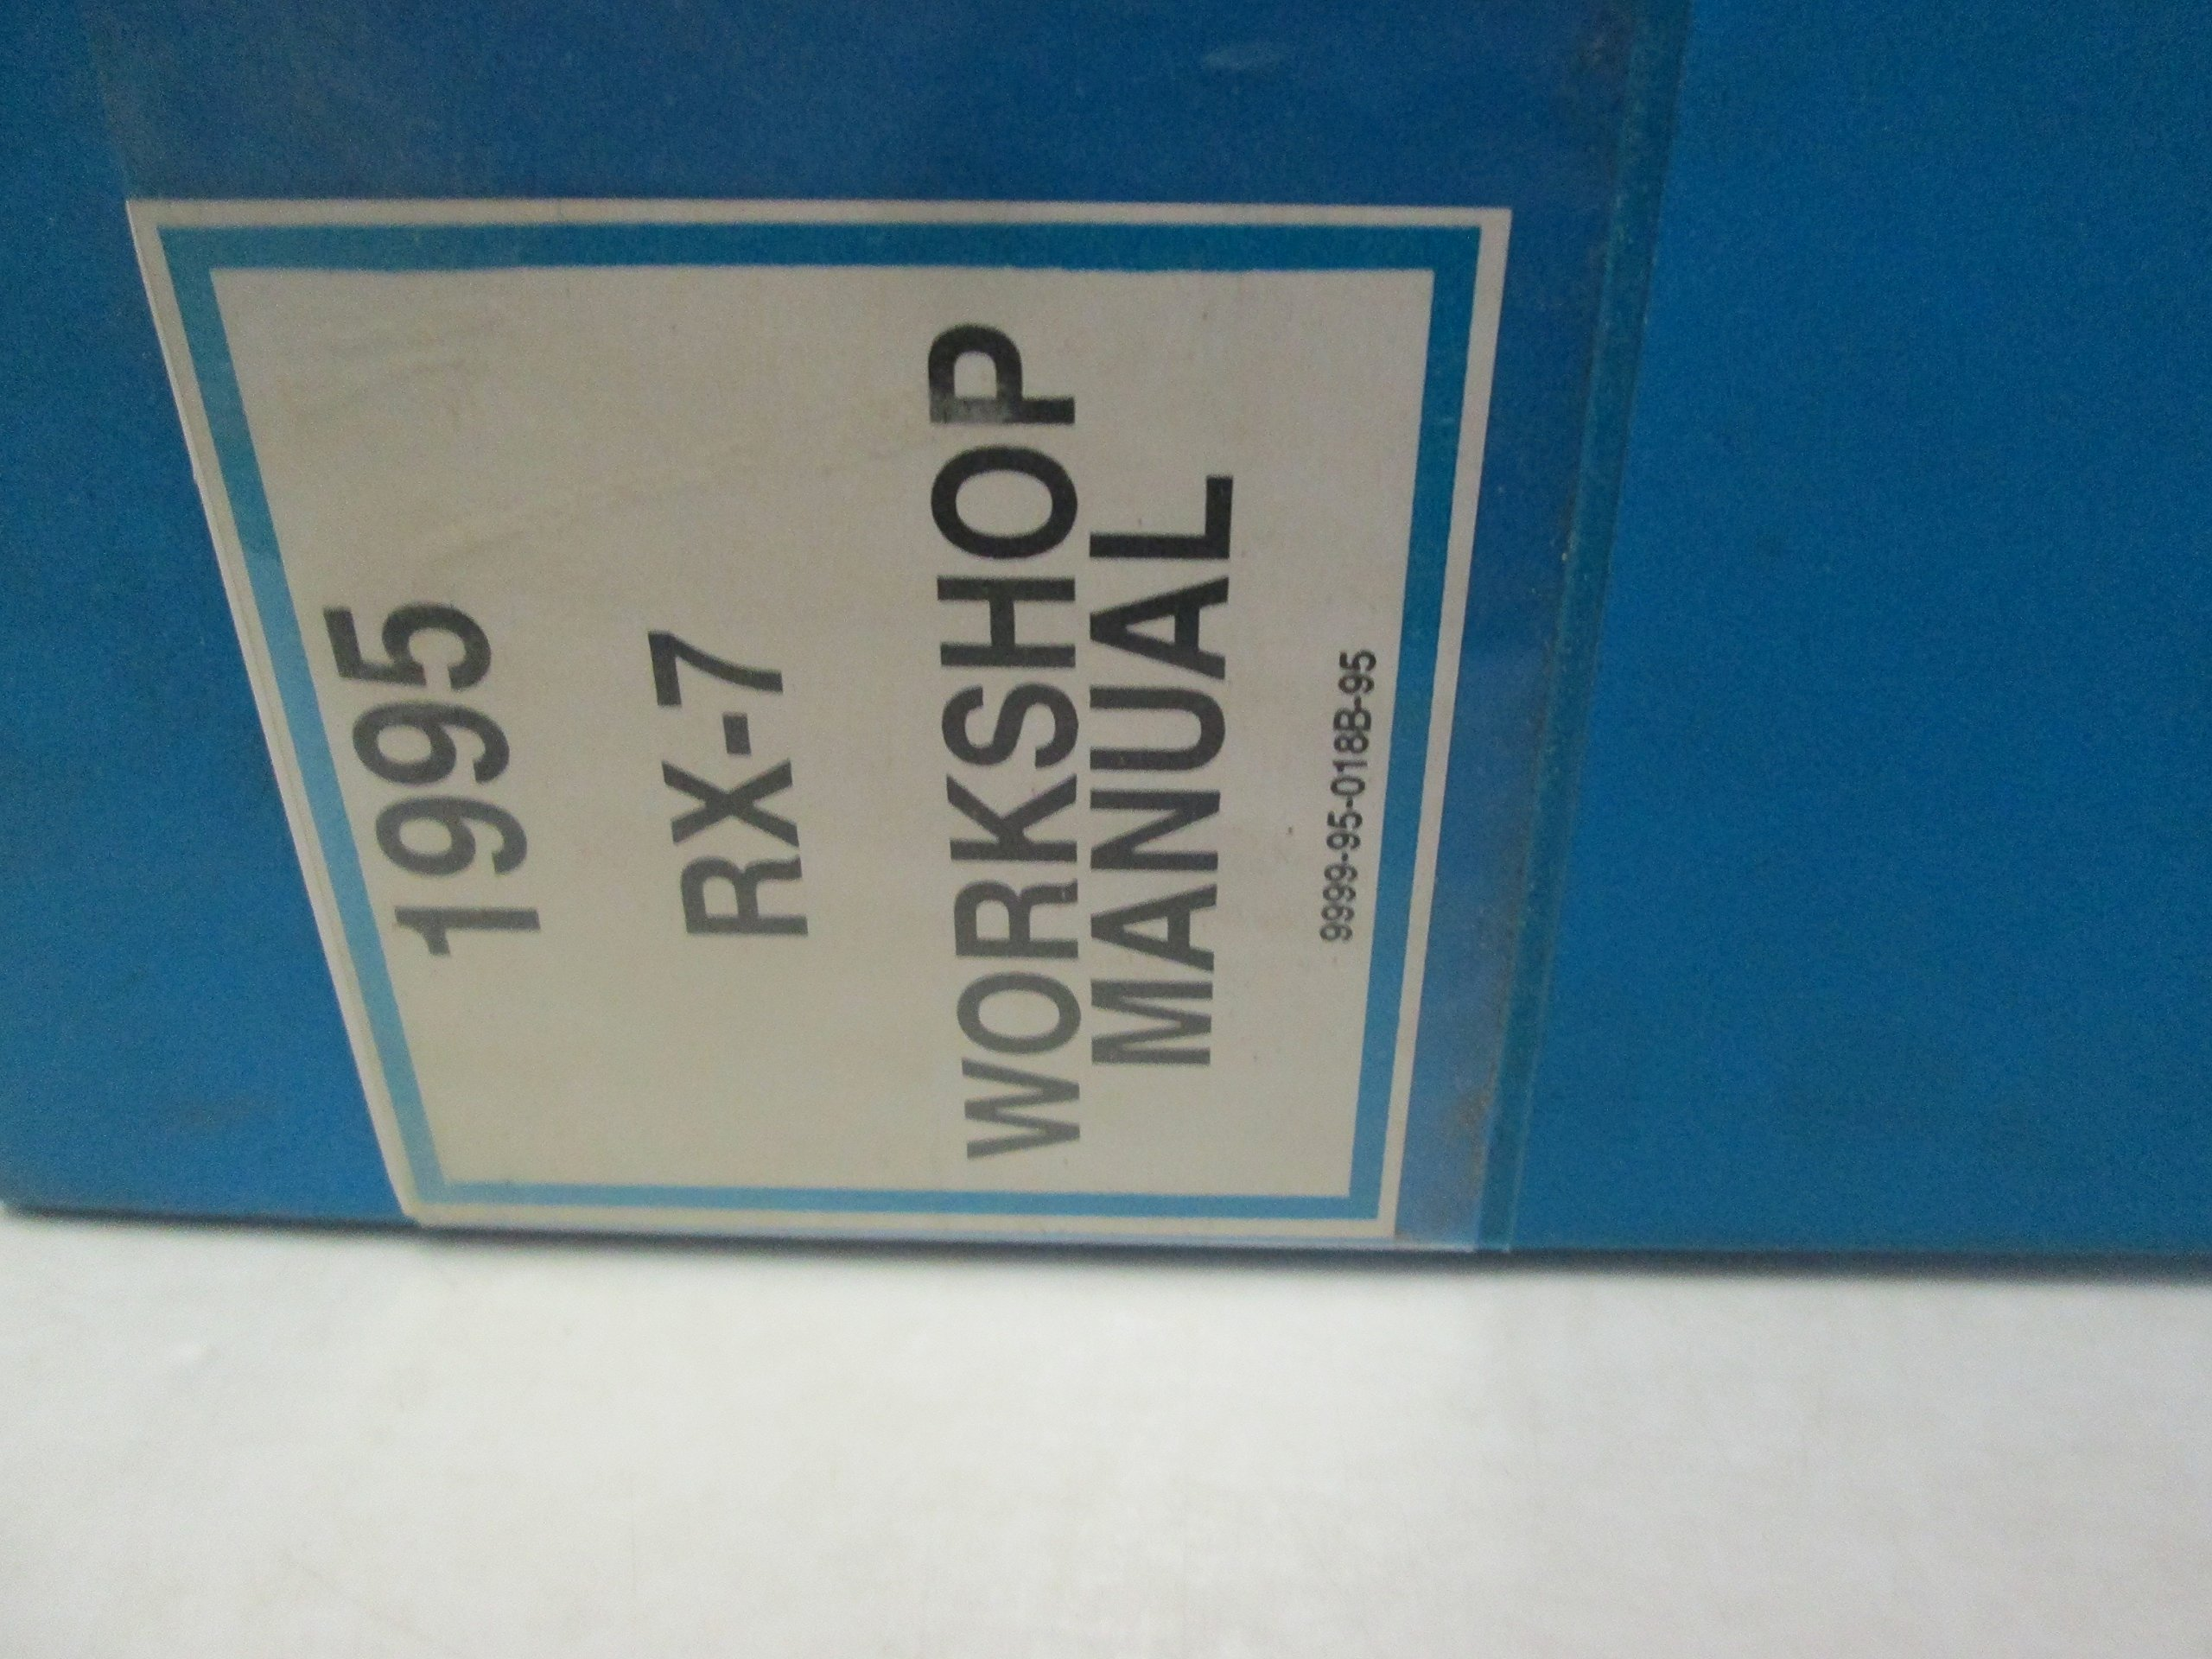 1995 Mazda Rx7 Rx 7 Service Repair Shop Workshop Manual Factory Oem Mazda Amazon Com Books